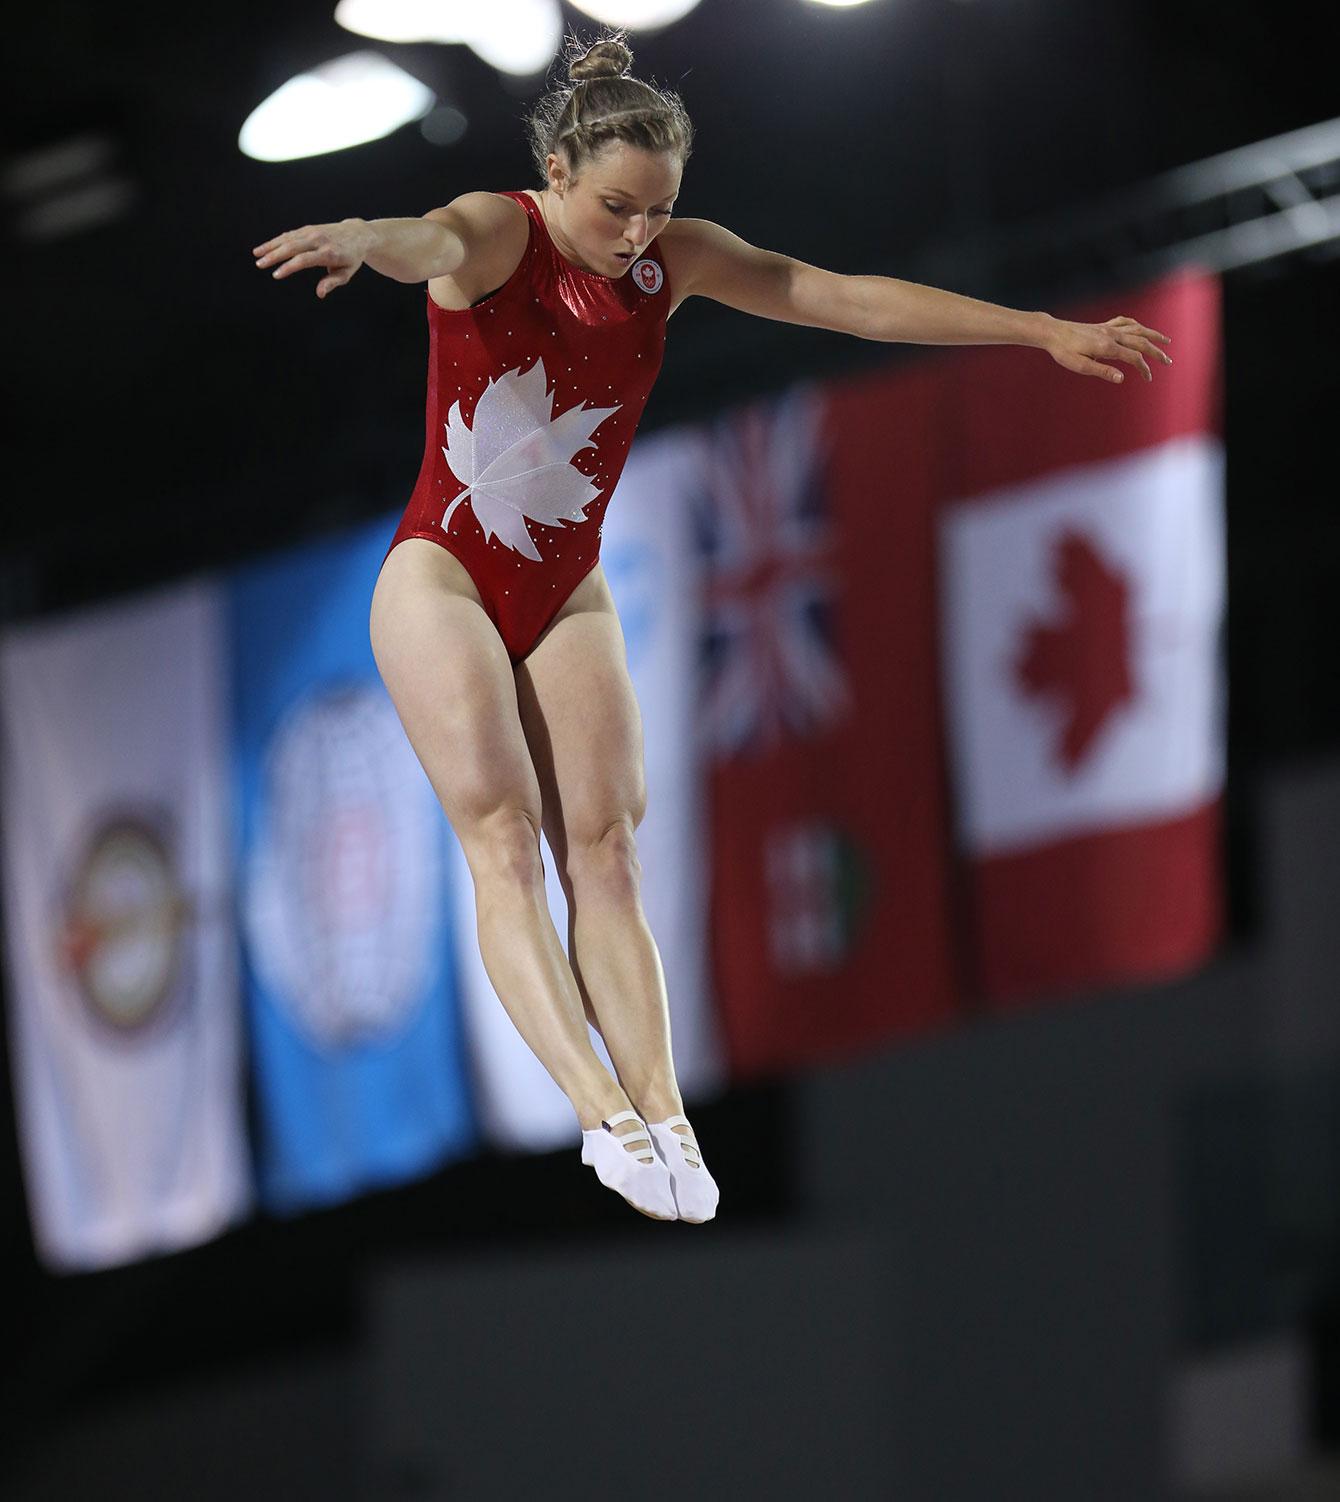 MacLennan in the air jumping